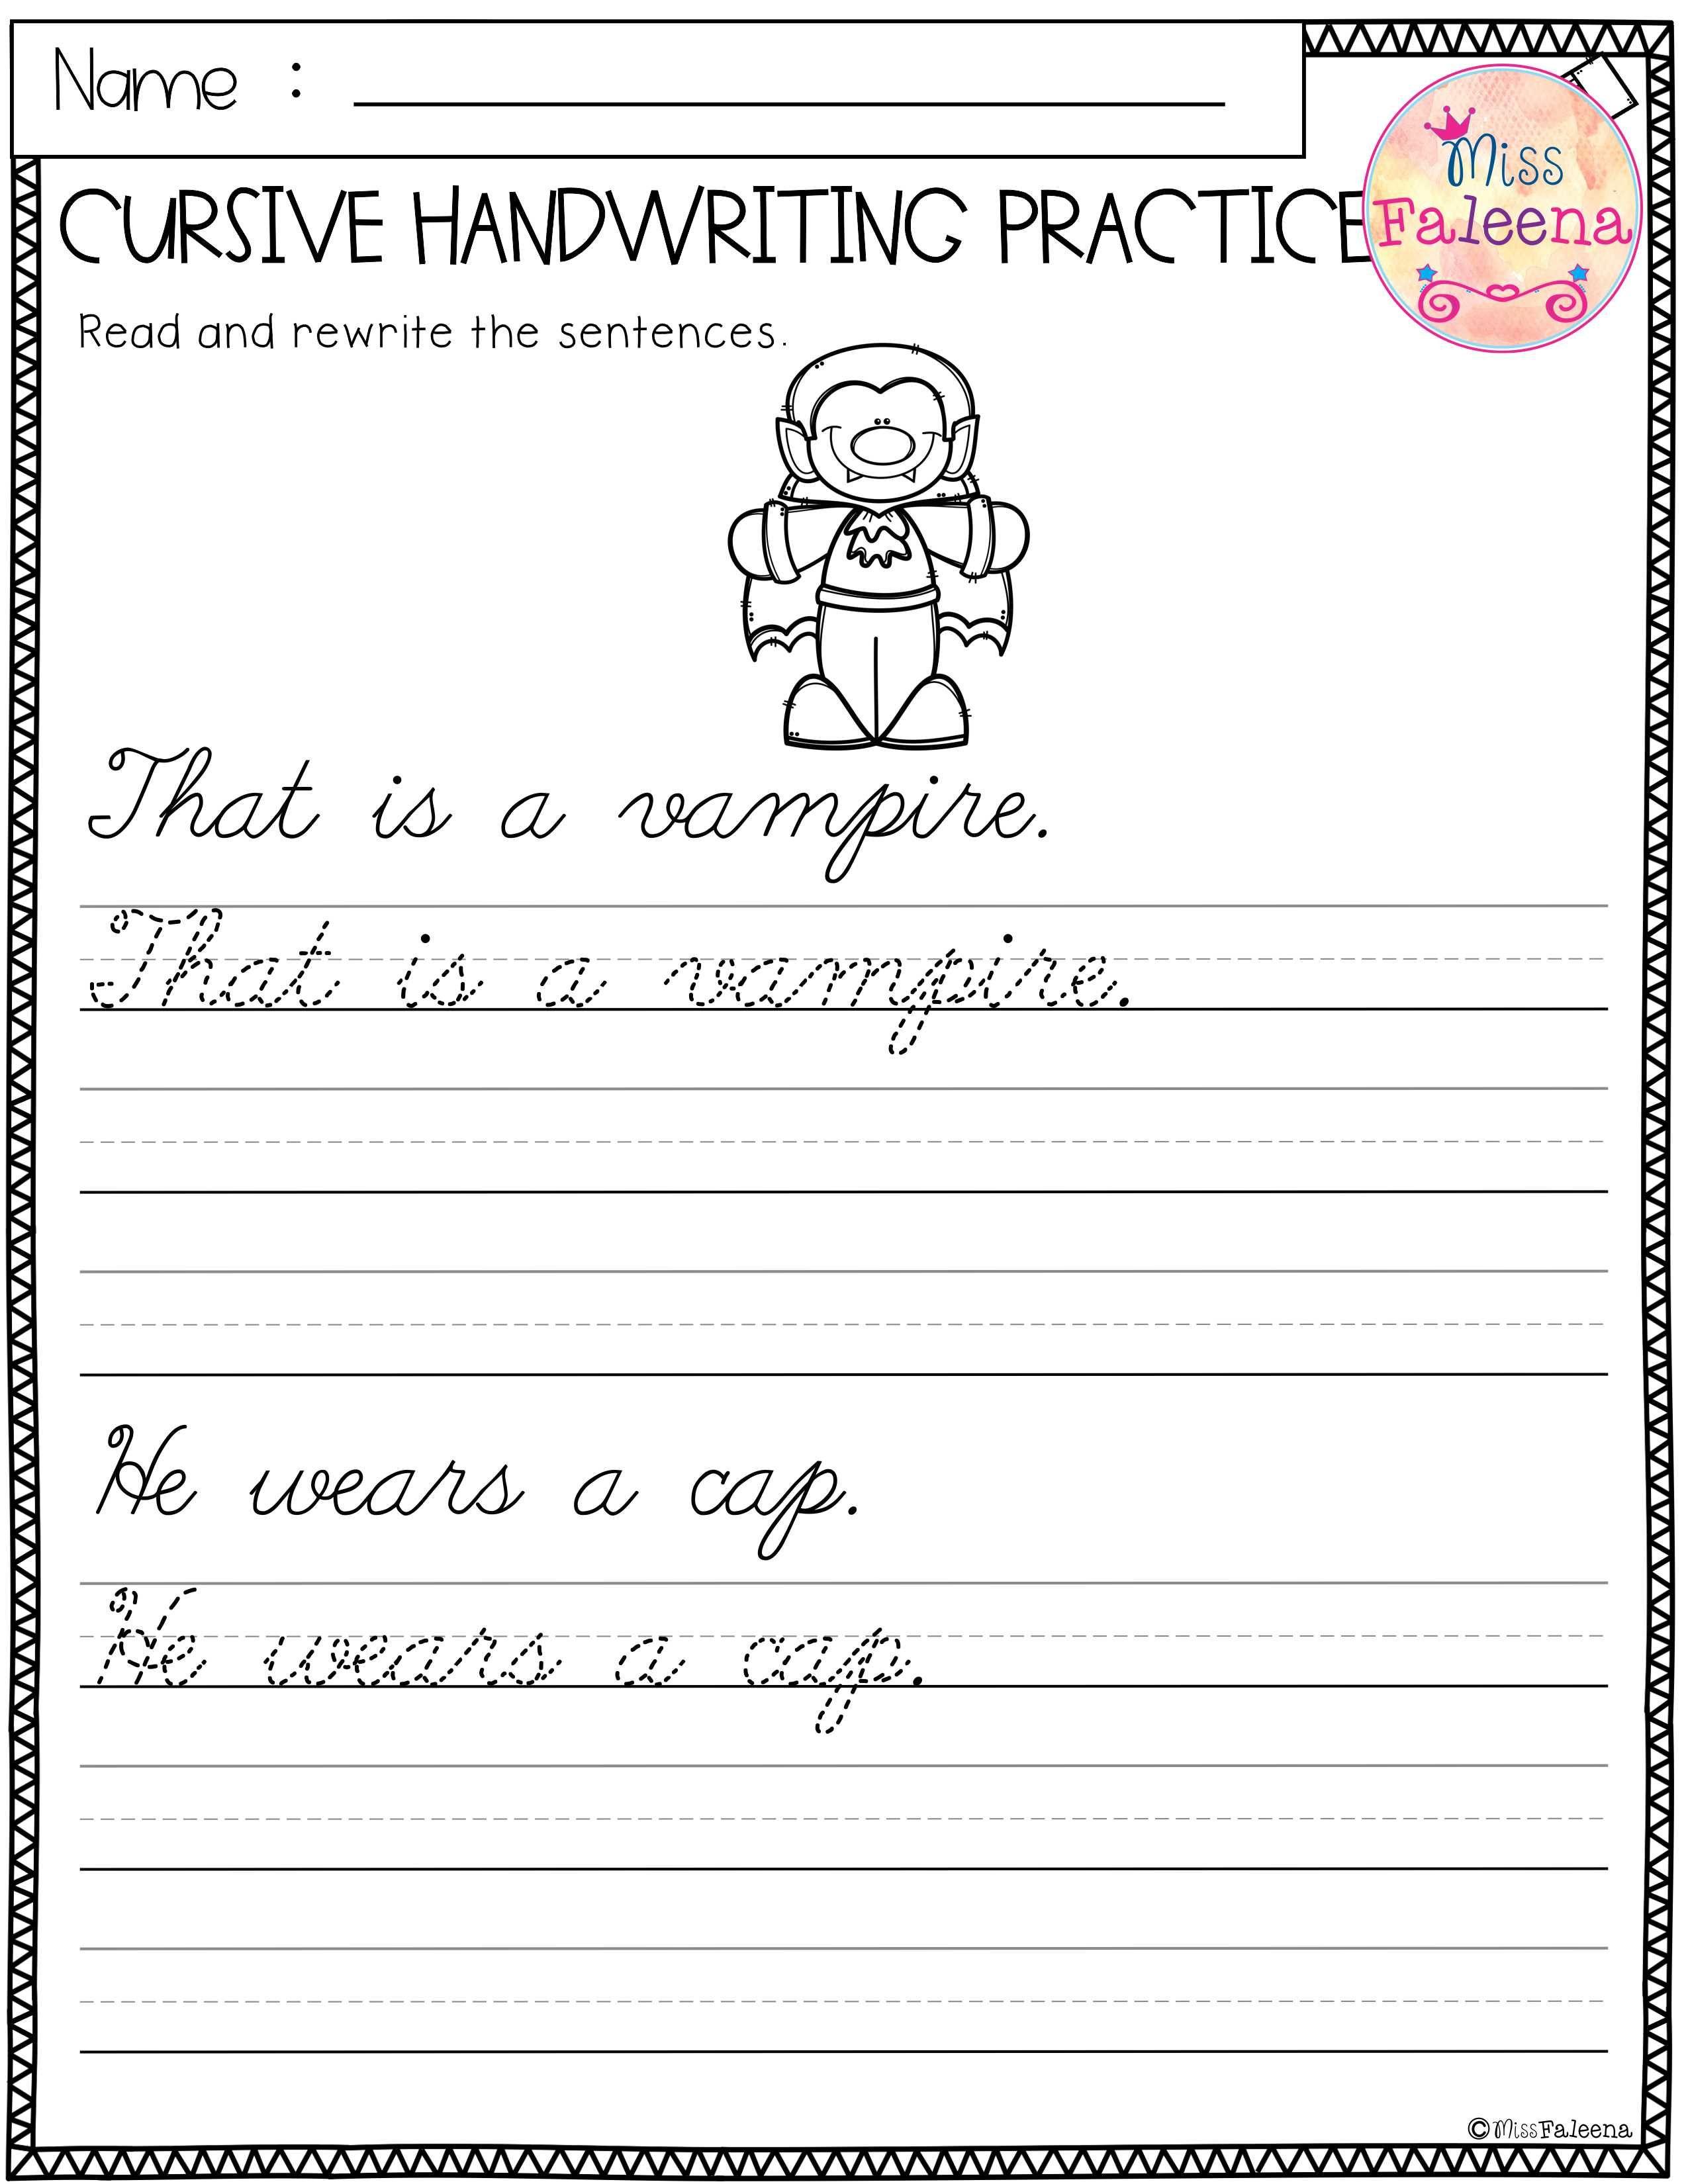 Halloween Cursive Handwriting This Product Has 20 Pages Of Handwriting Worksheets This Pro Cursive Handwriting Practice Handwriting Practice Cursive Writing [ 3300 x 2550 Pixel ]